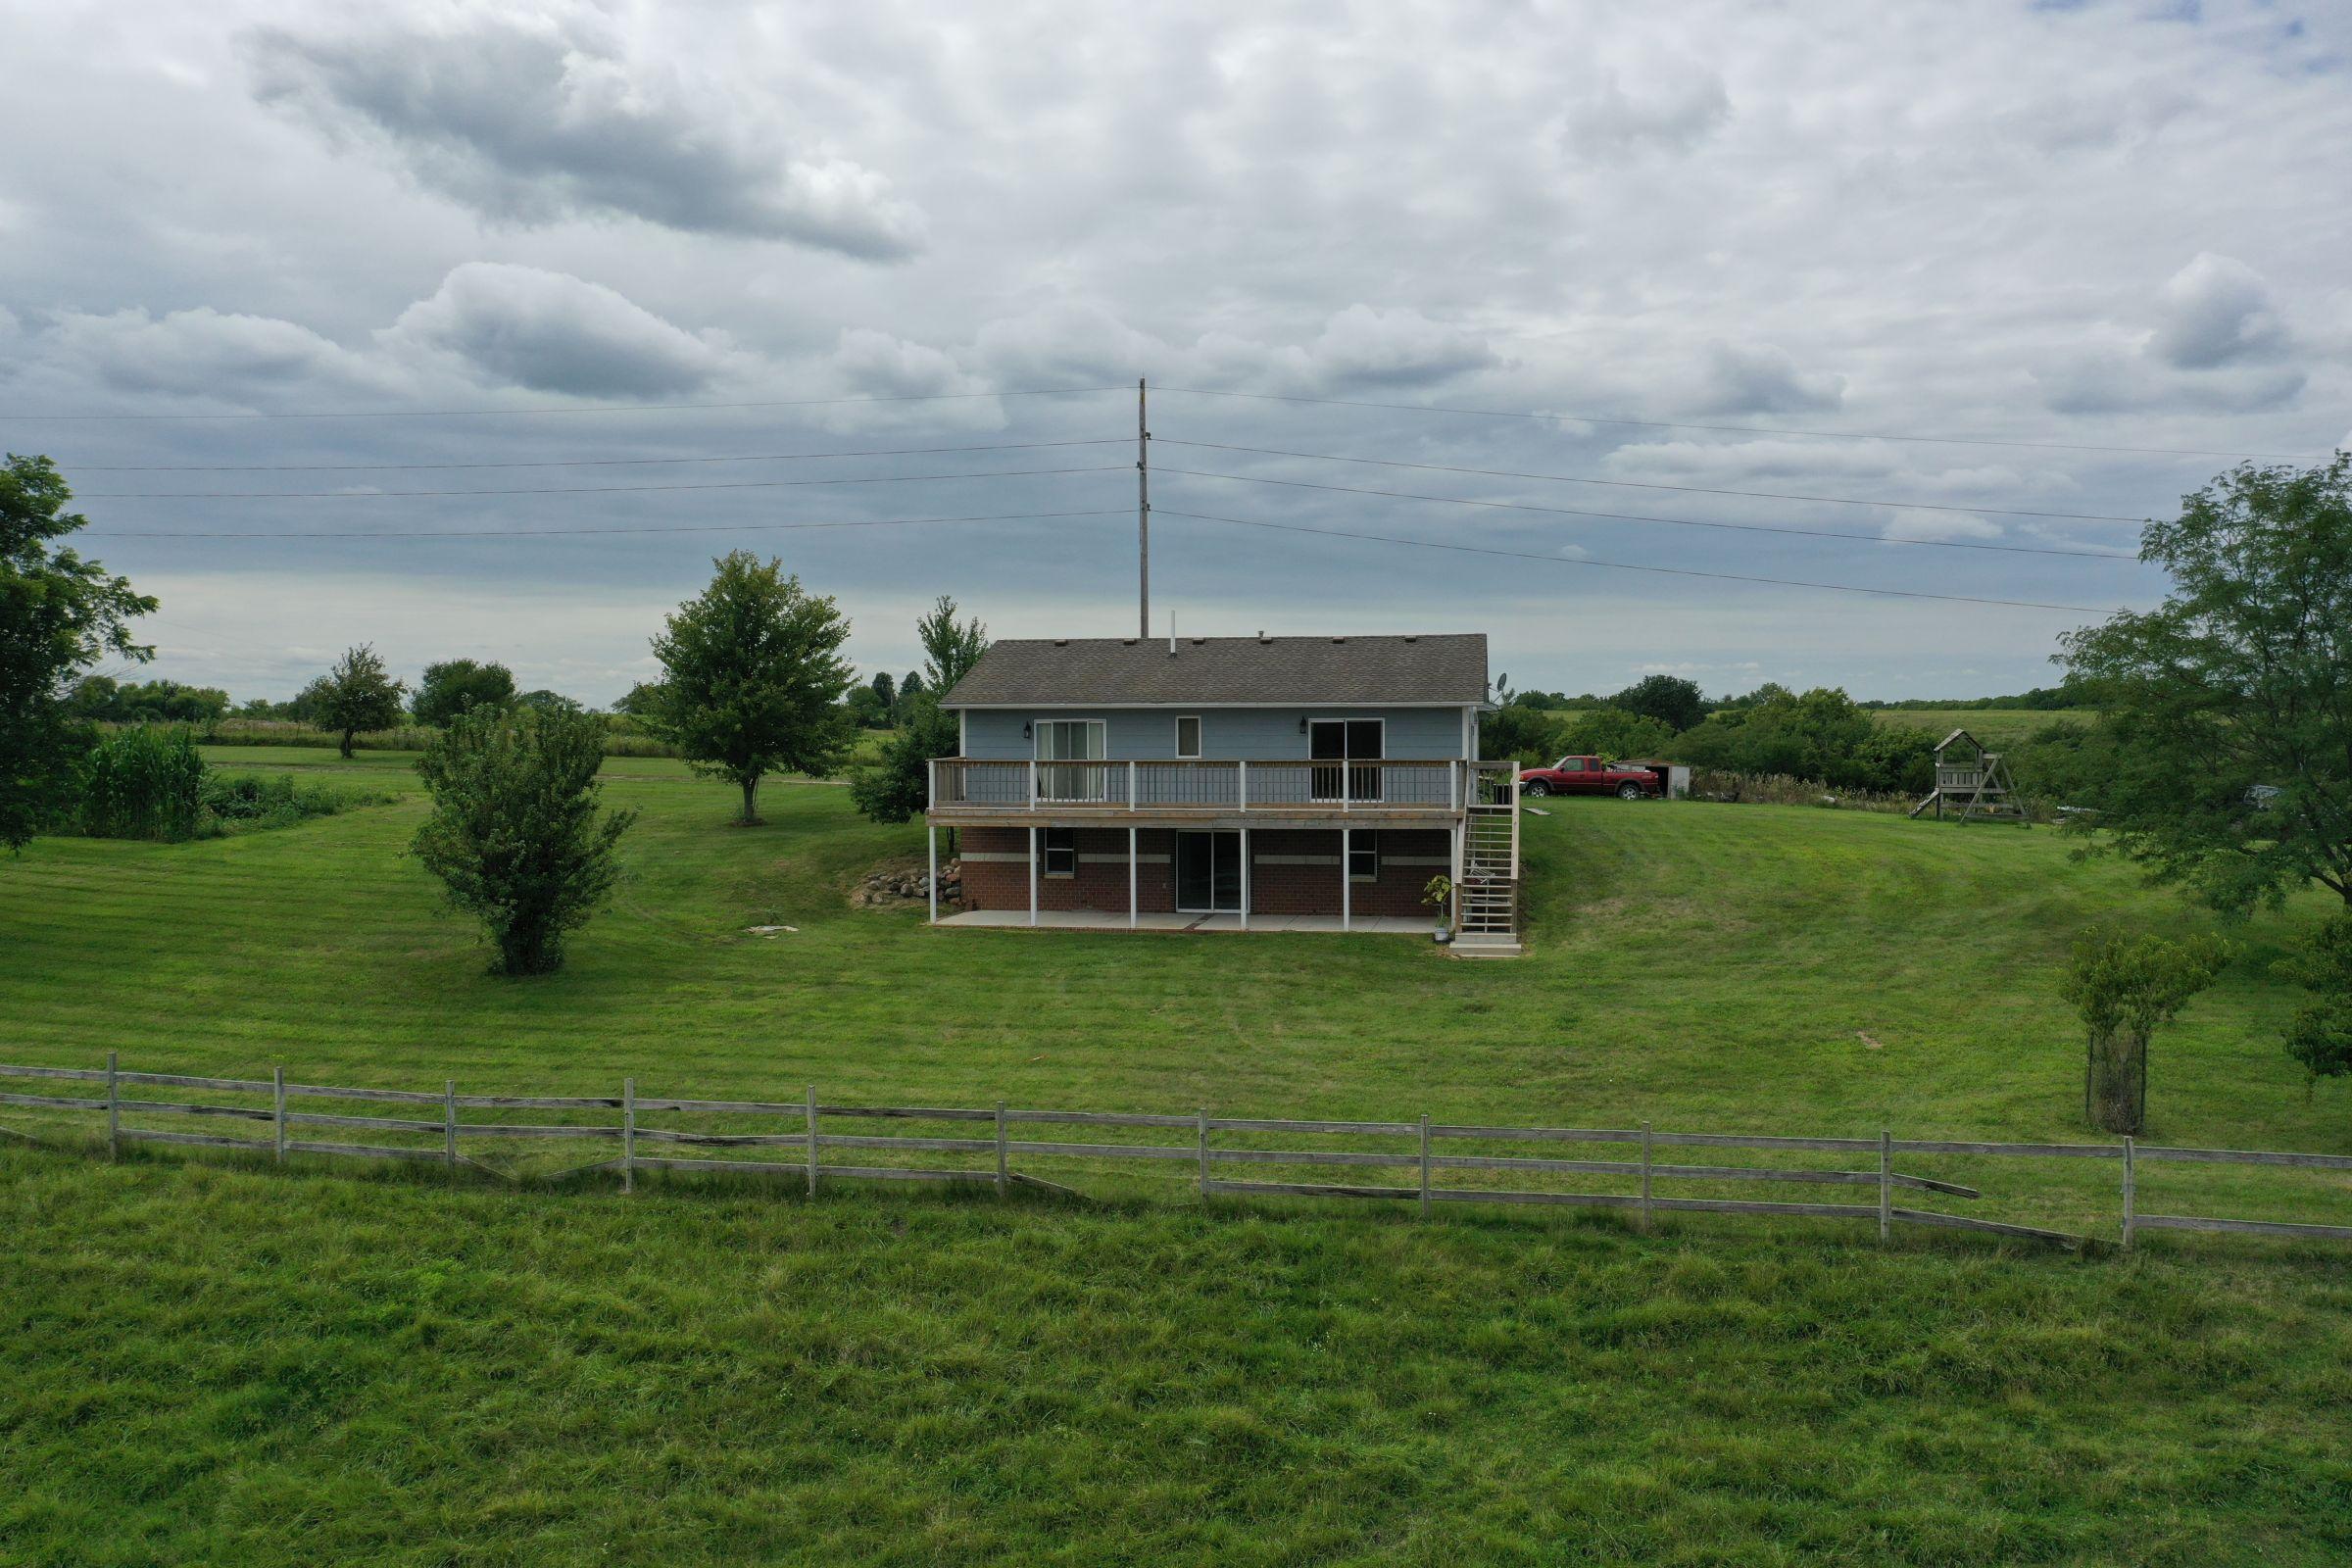 residential-warren-county-iowa-12-acres-listing-number-15104-1-2020-08-08-184809.jpg